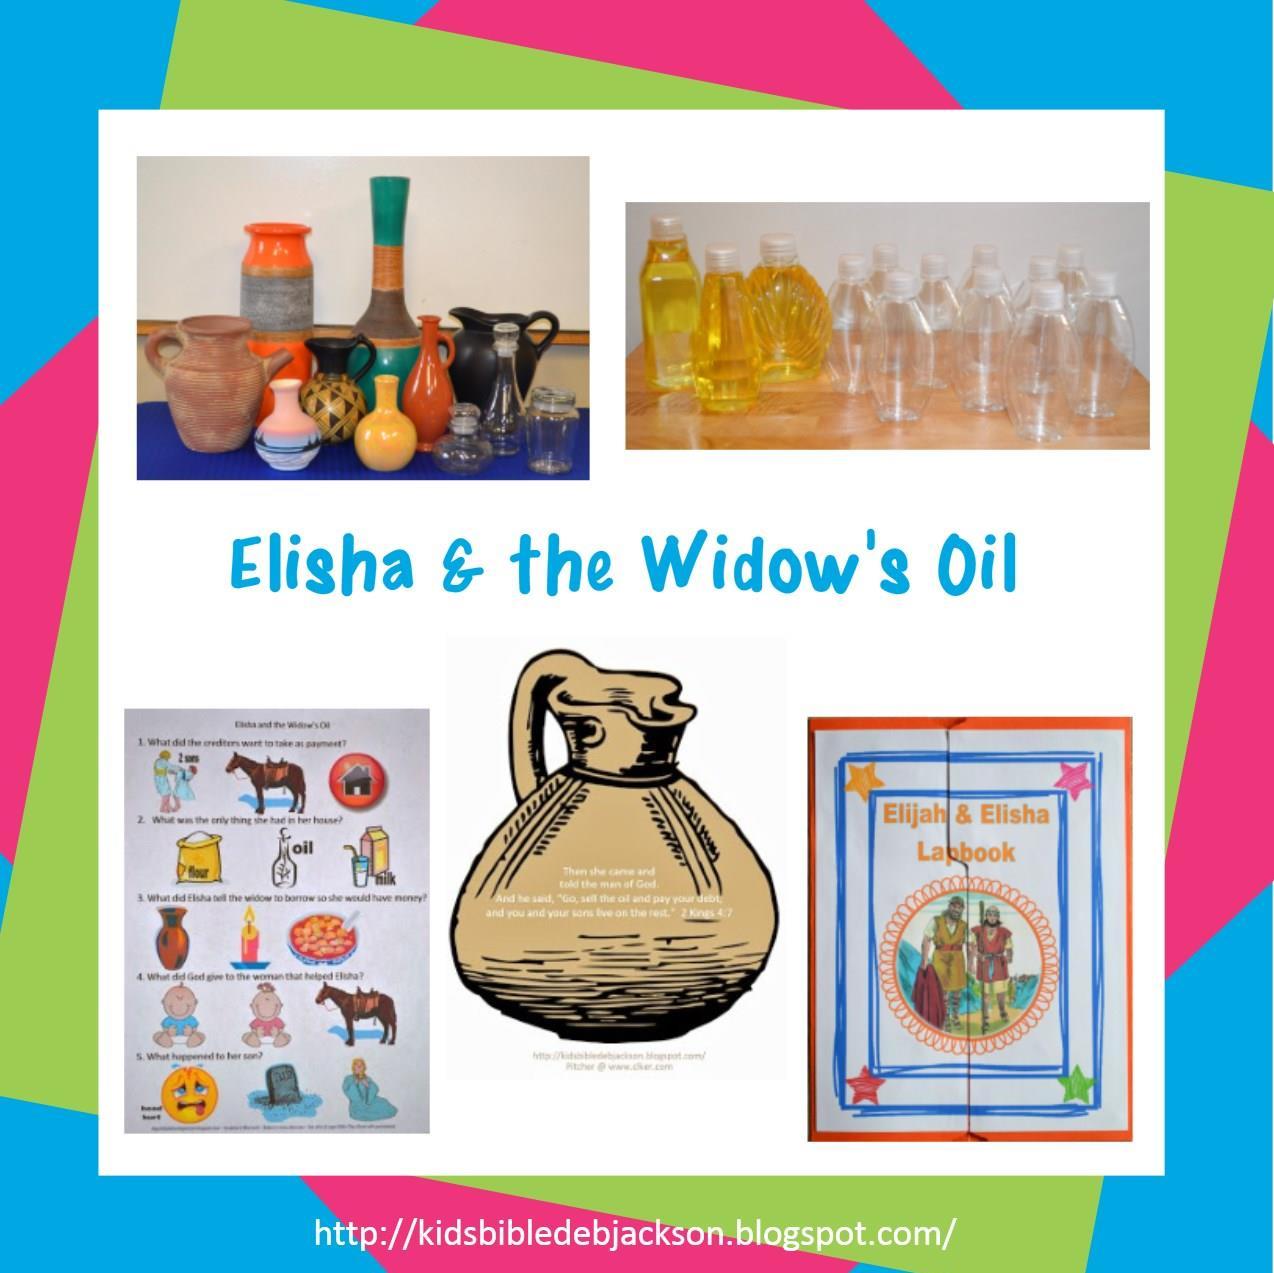 http://kidsbibledebjackson.blogspot.com/2014/03/elisha-widows-oil.html